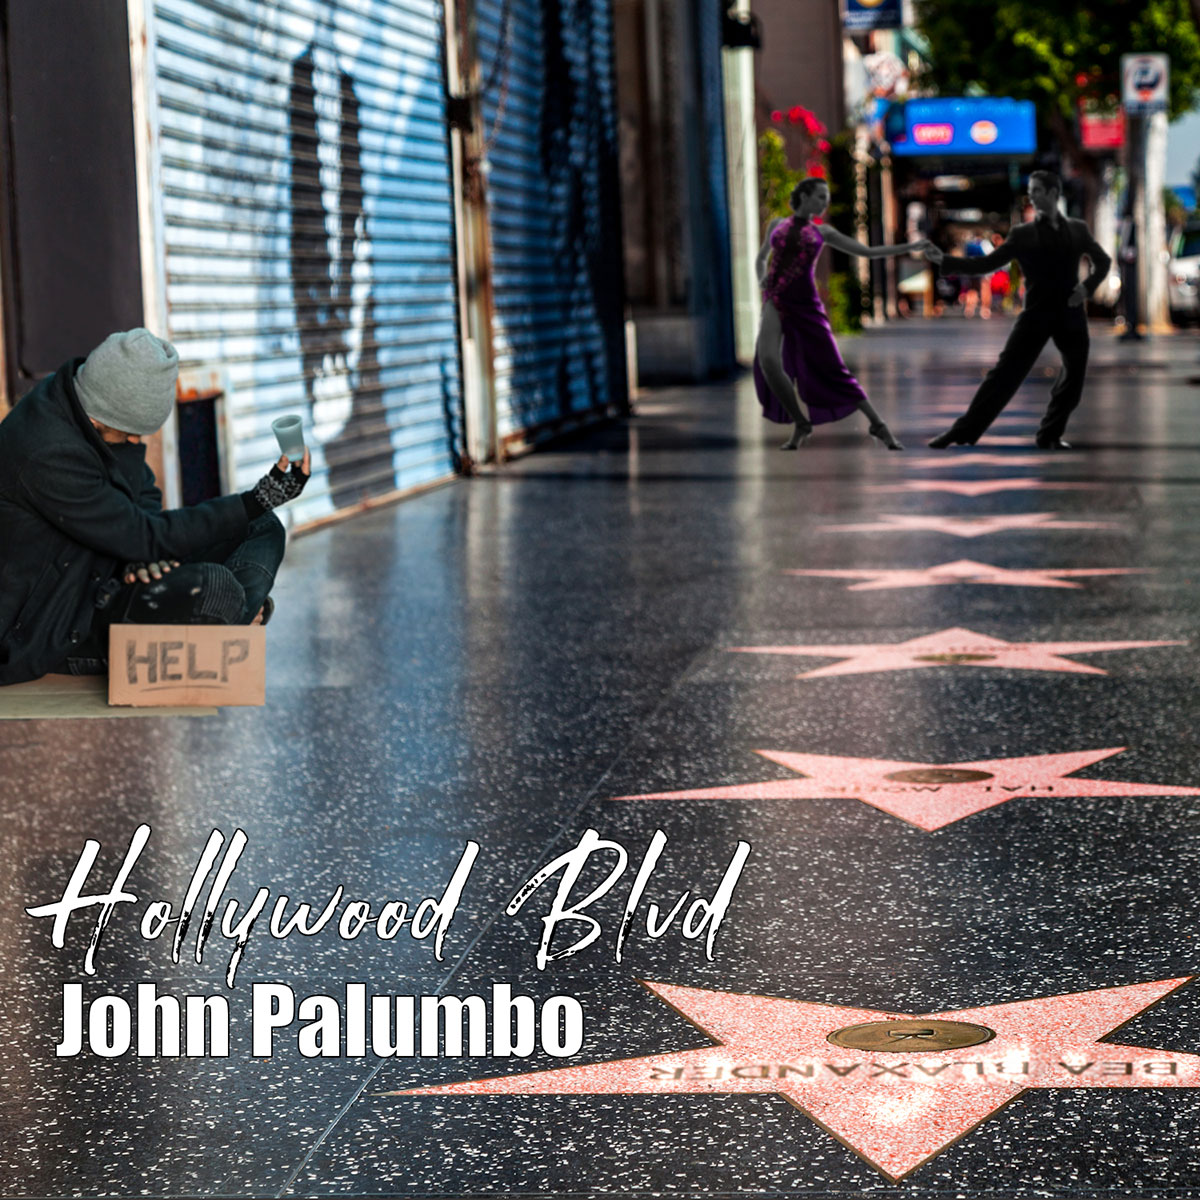 John Palubo - Hollywood Blvd